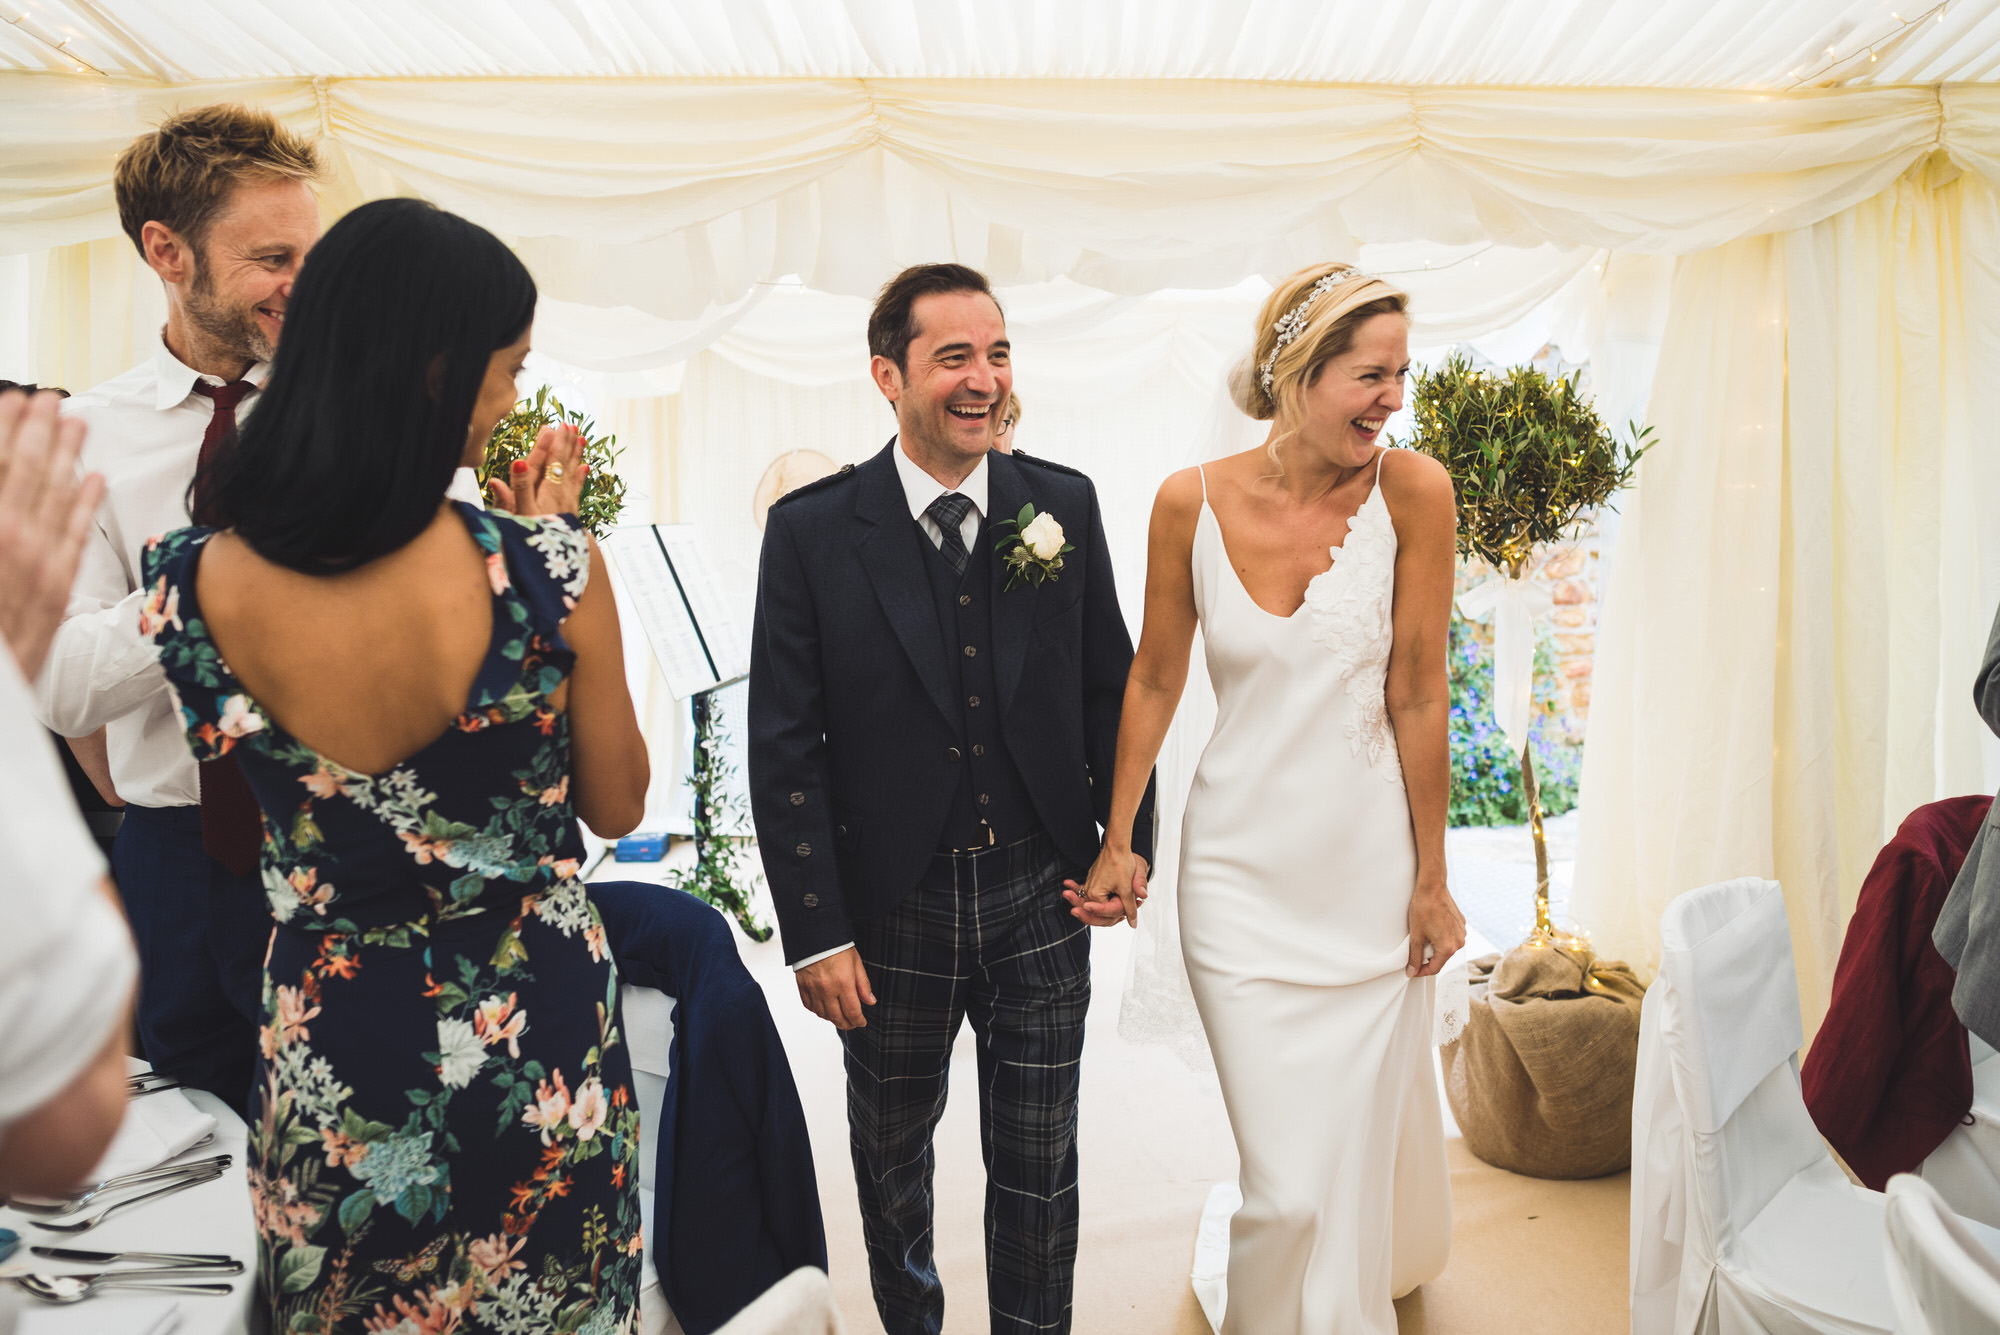 Dorset marquee wedding by the sea simon biffen photography 38